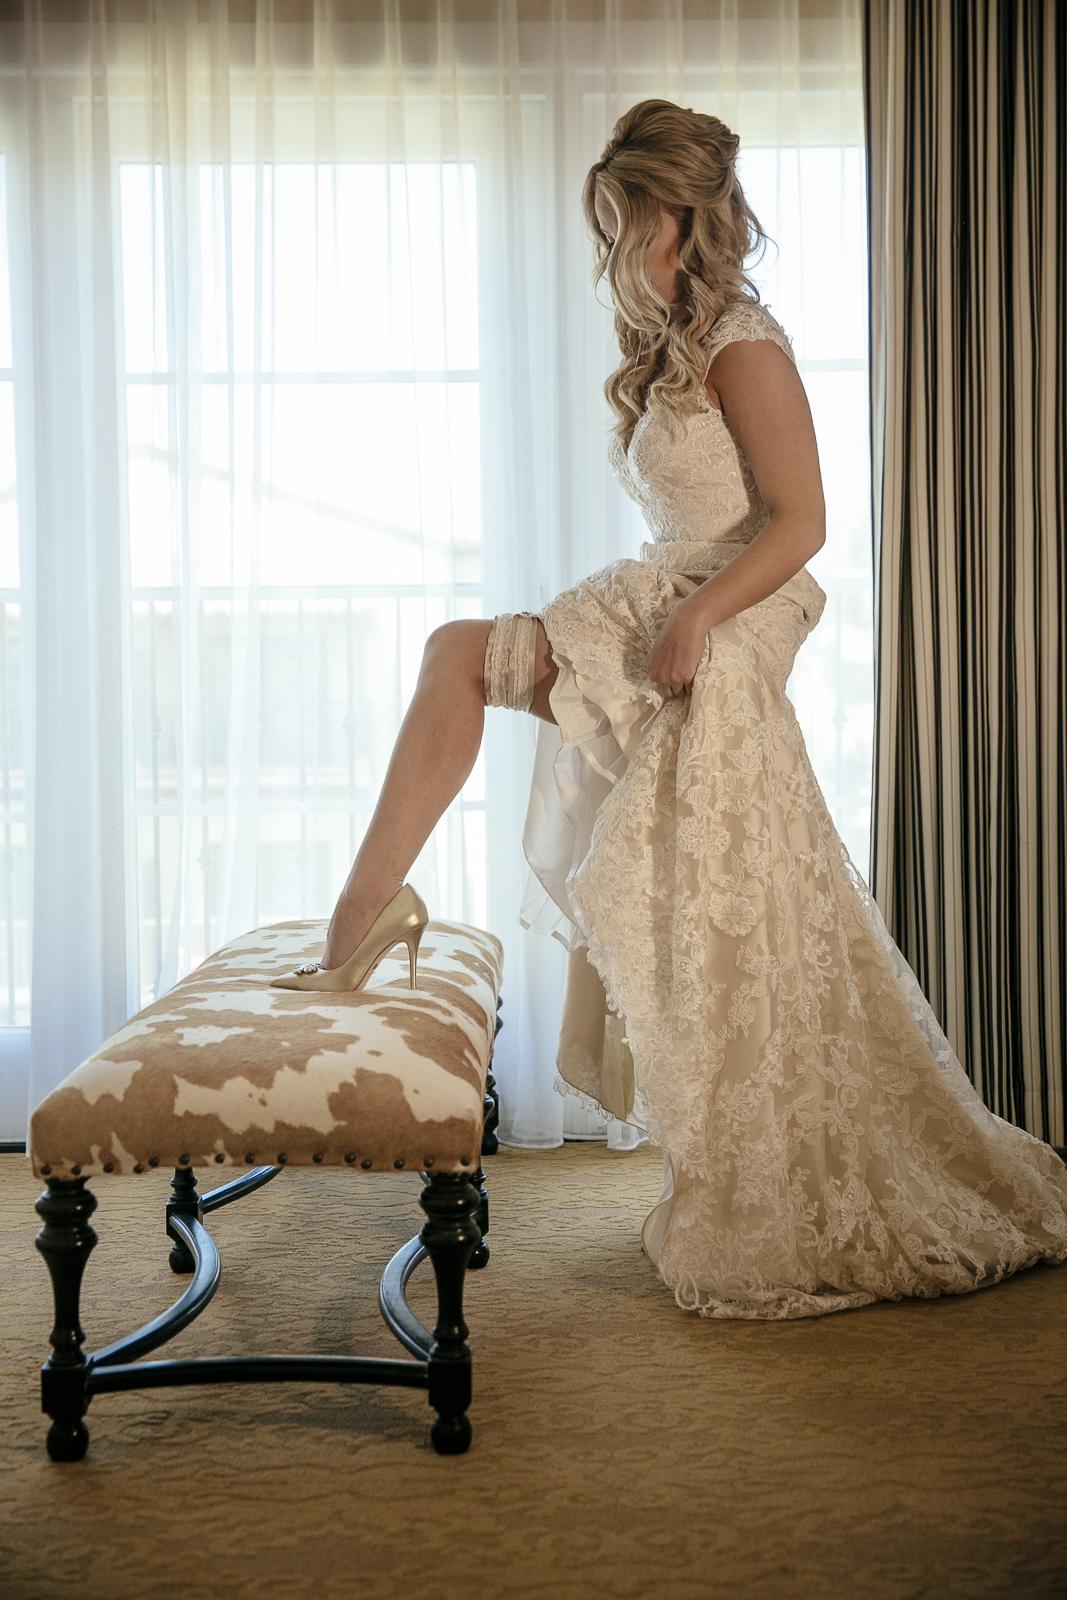 0006_CHRISTINE_&_MATT_WEDDING_DARLINGTON_HOUSE_2016IMG_2894.JPG